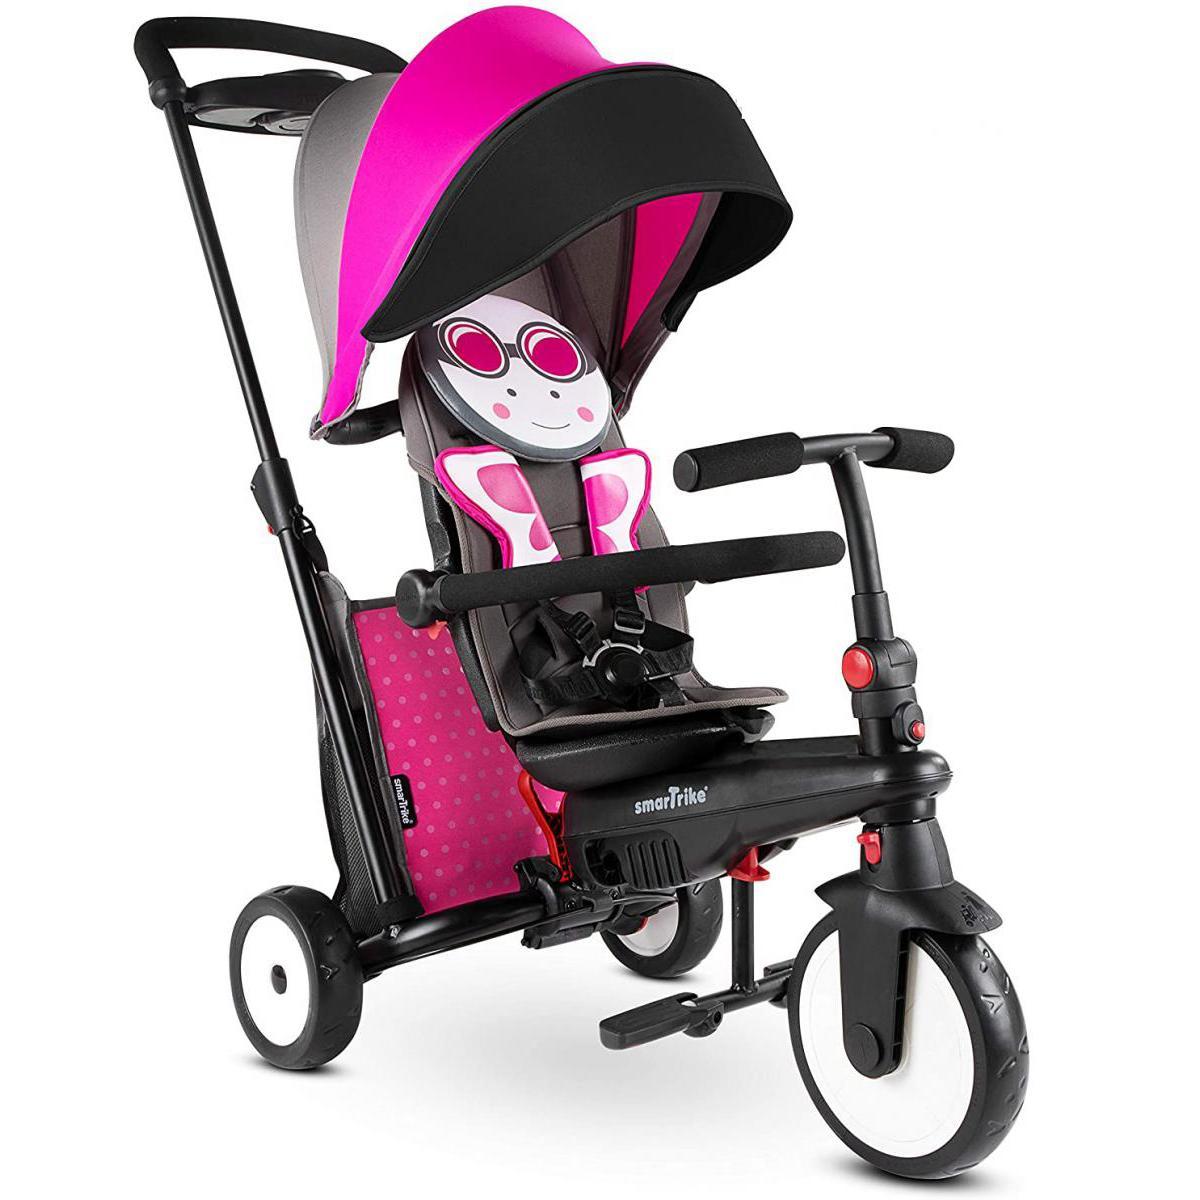 Smart Trike Smartrike Trike Evolutif Pliable STR5 noir/rose